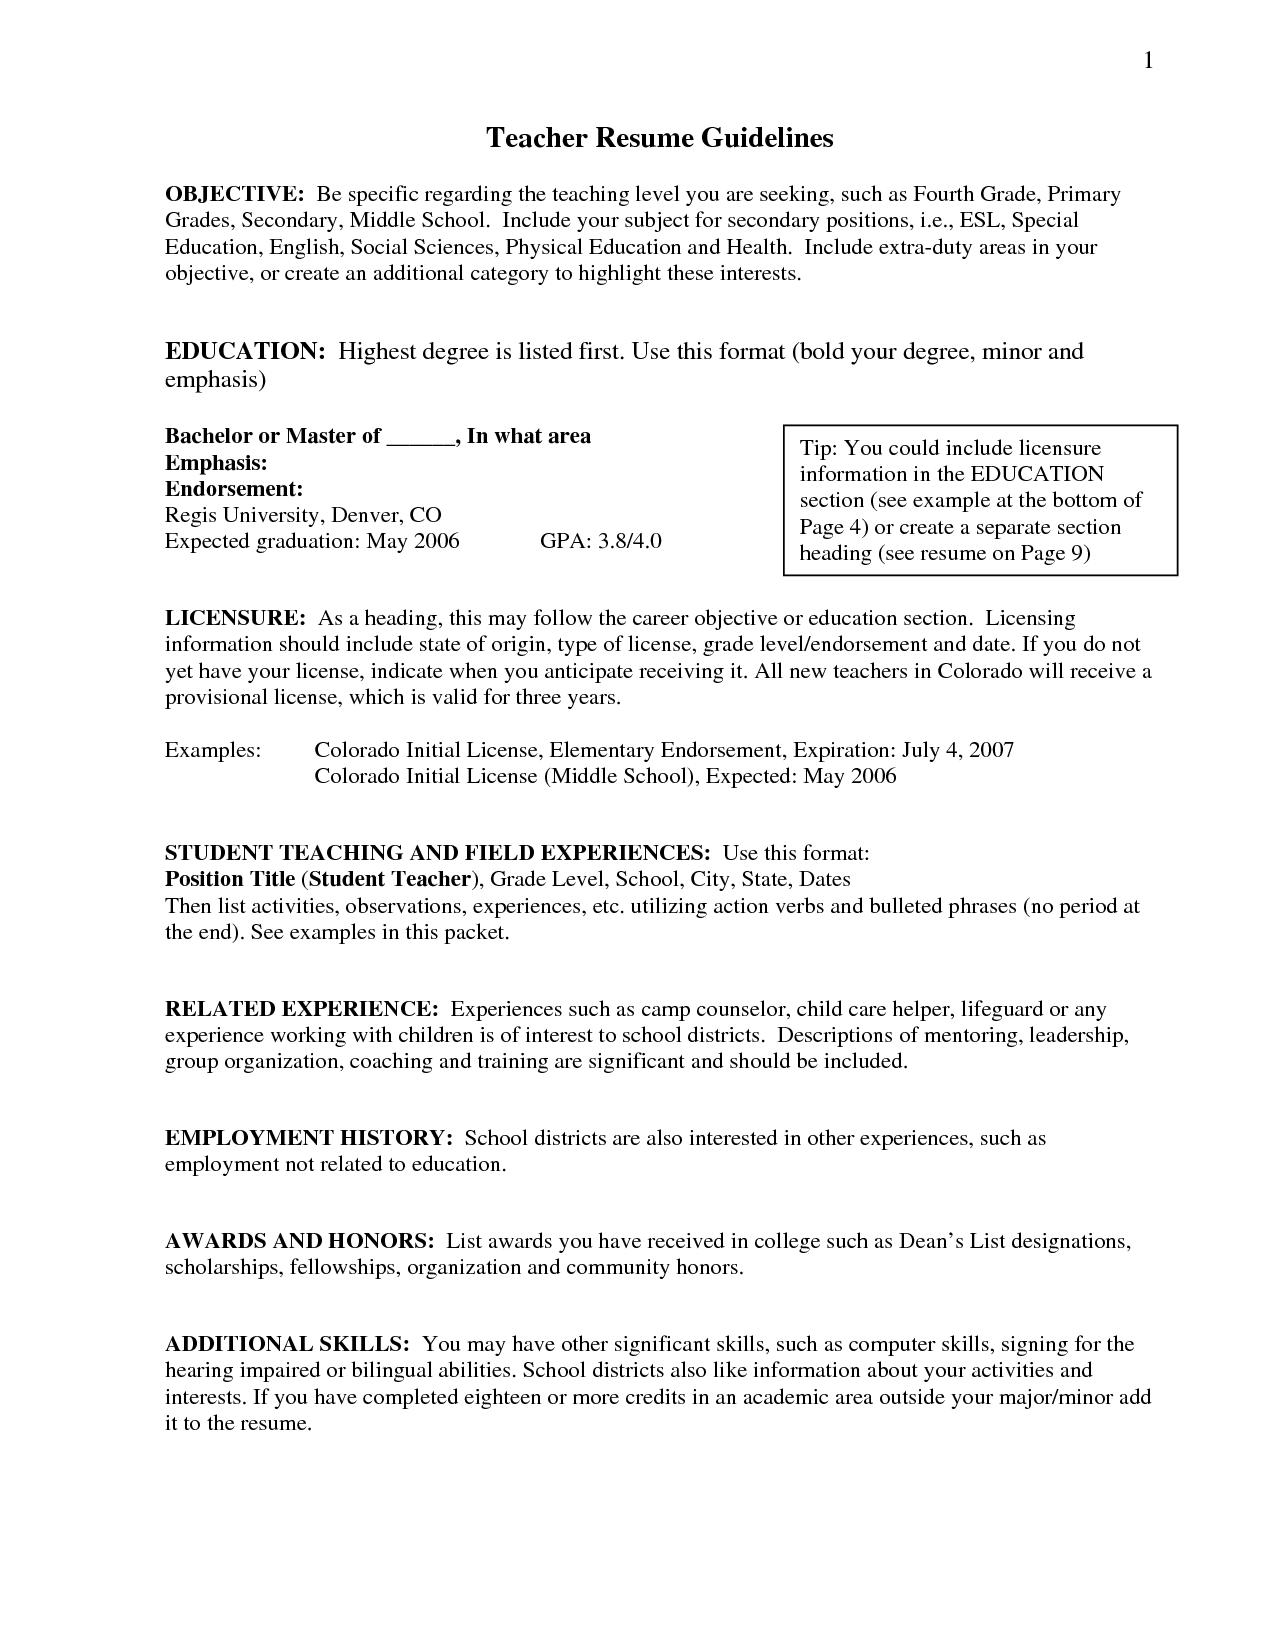 Resume Objective Statement For Teacher http//www